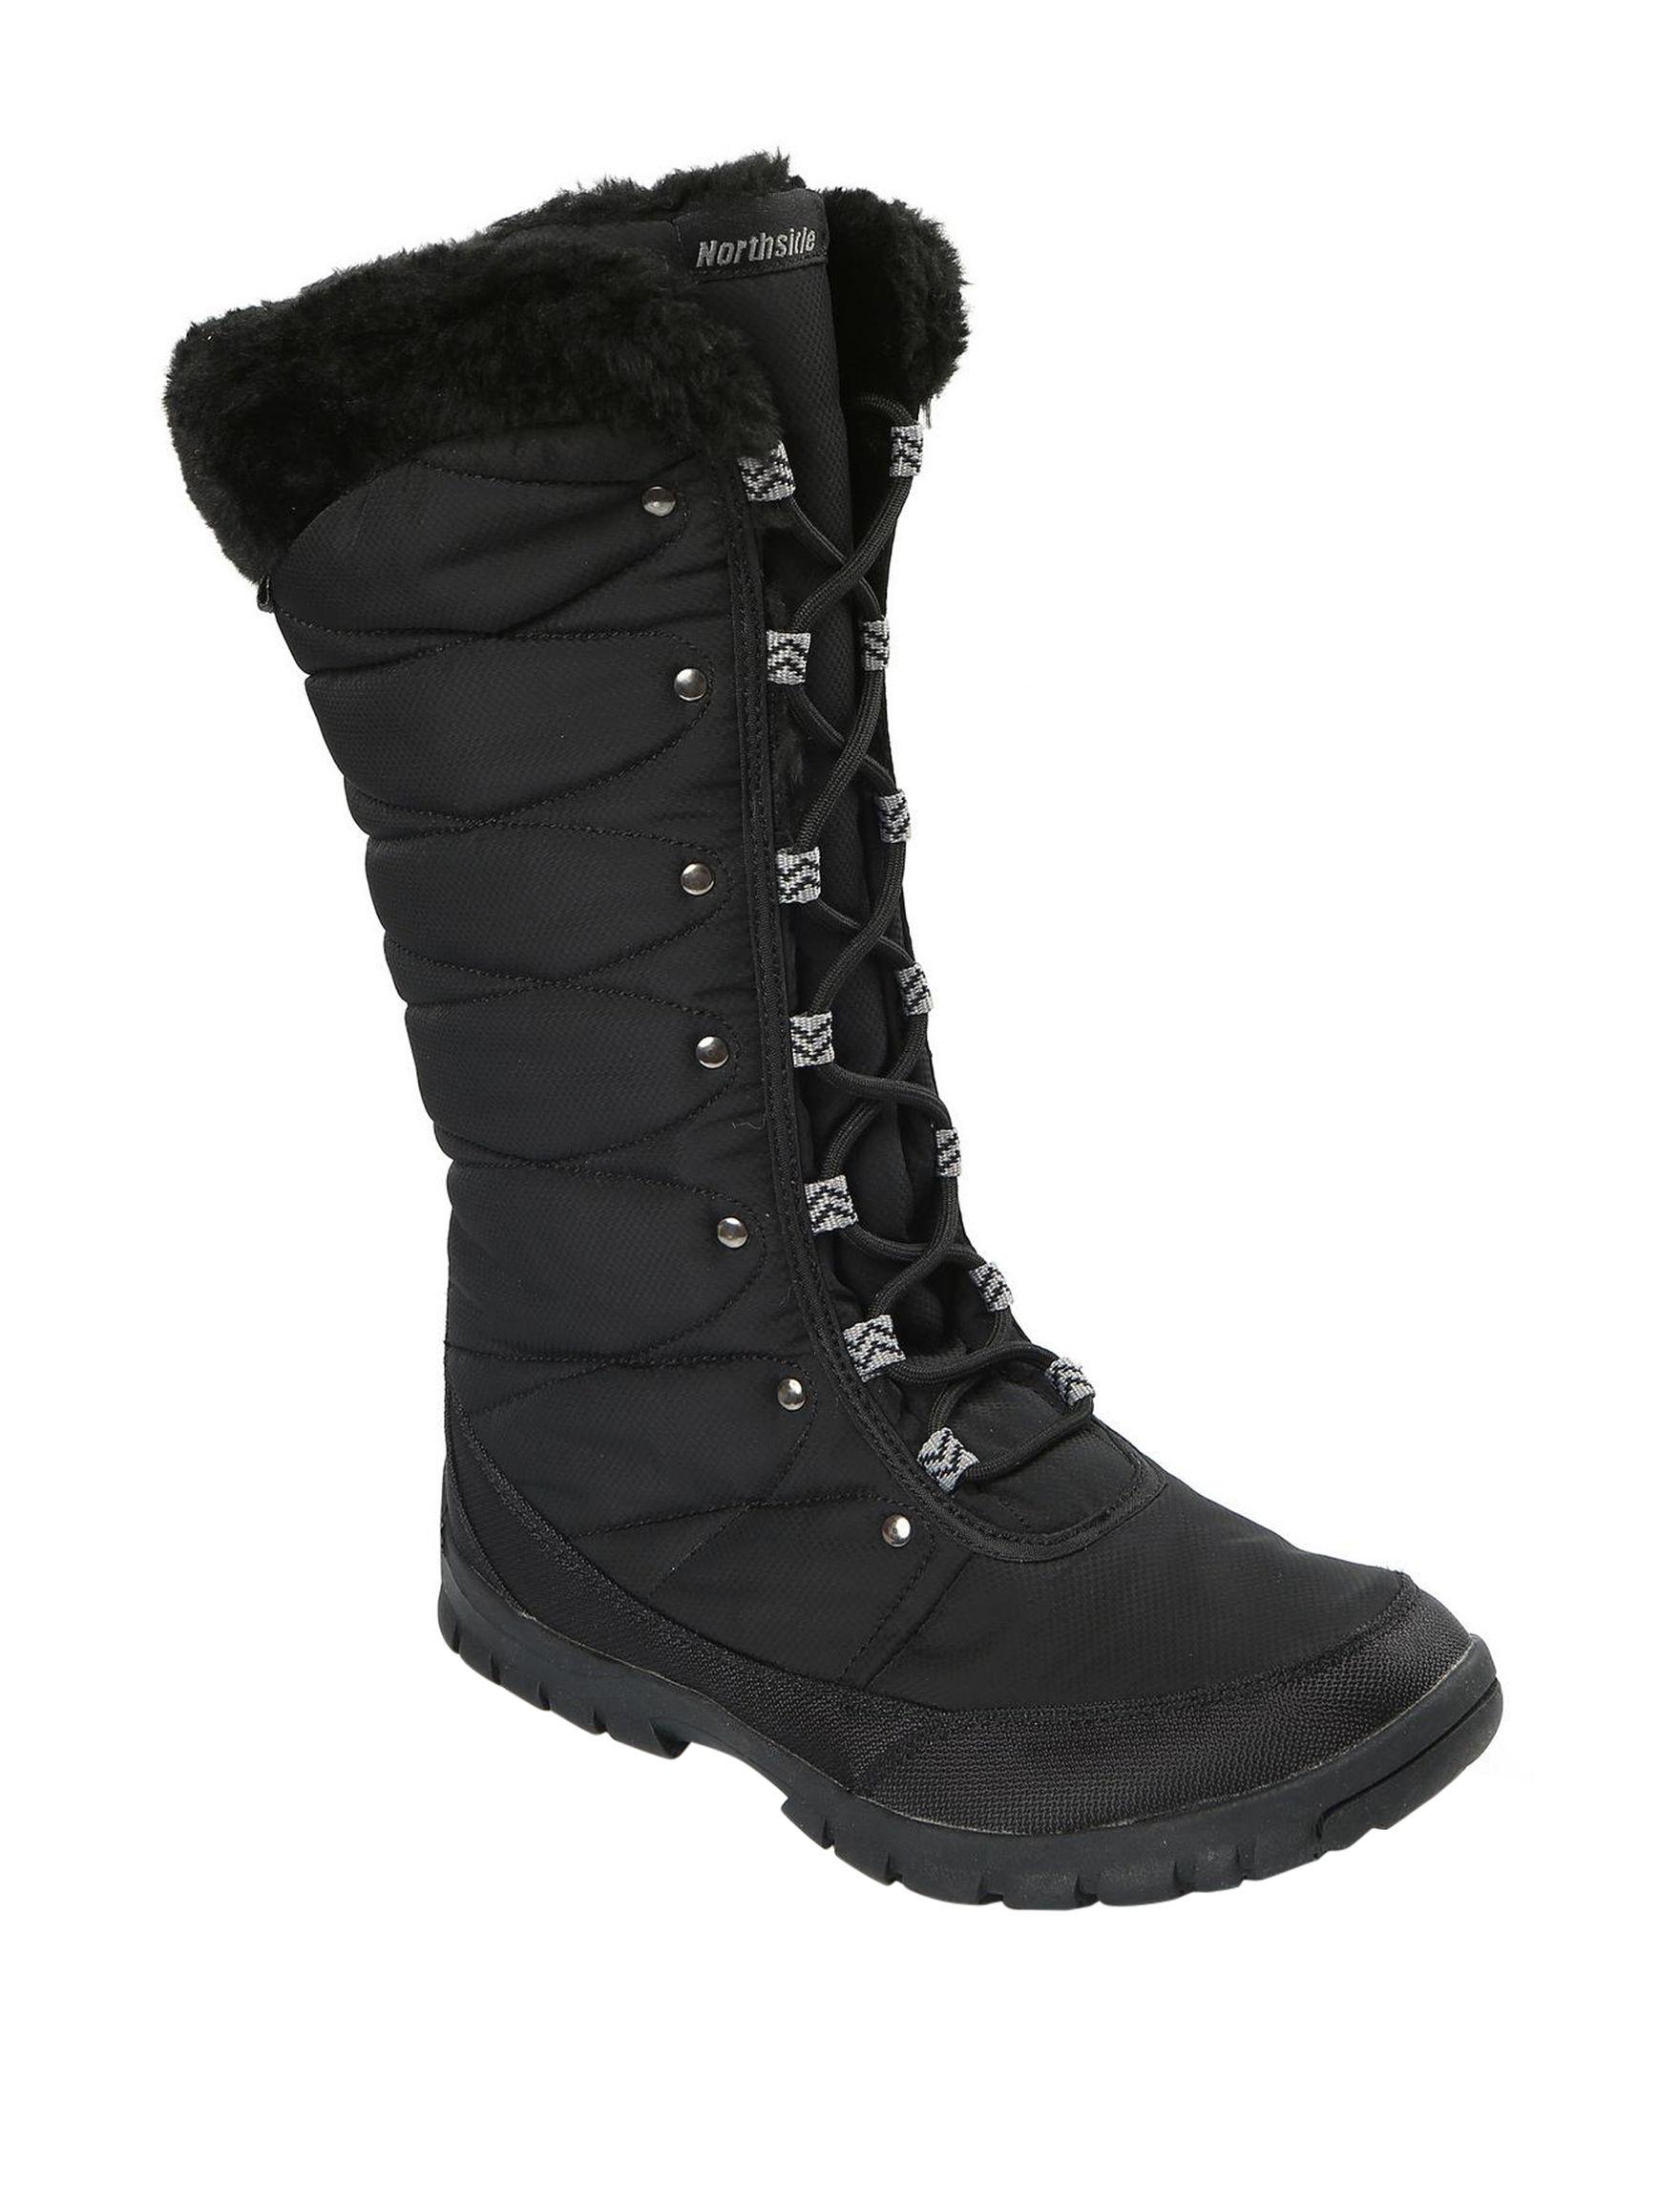 Northside Black Winter Boots